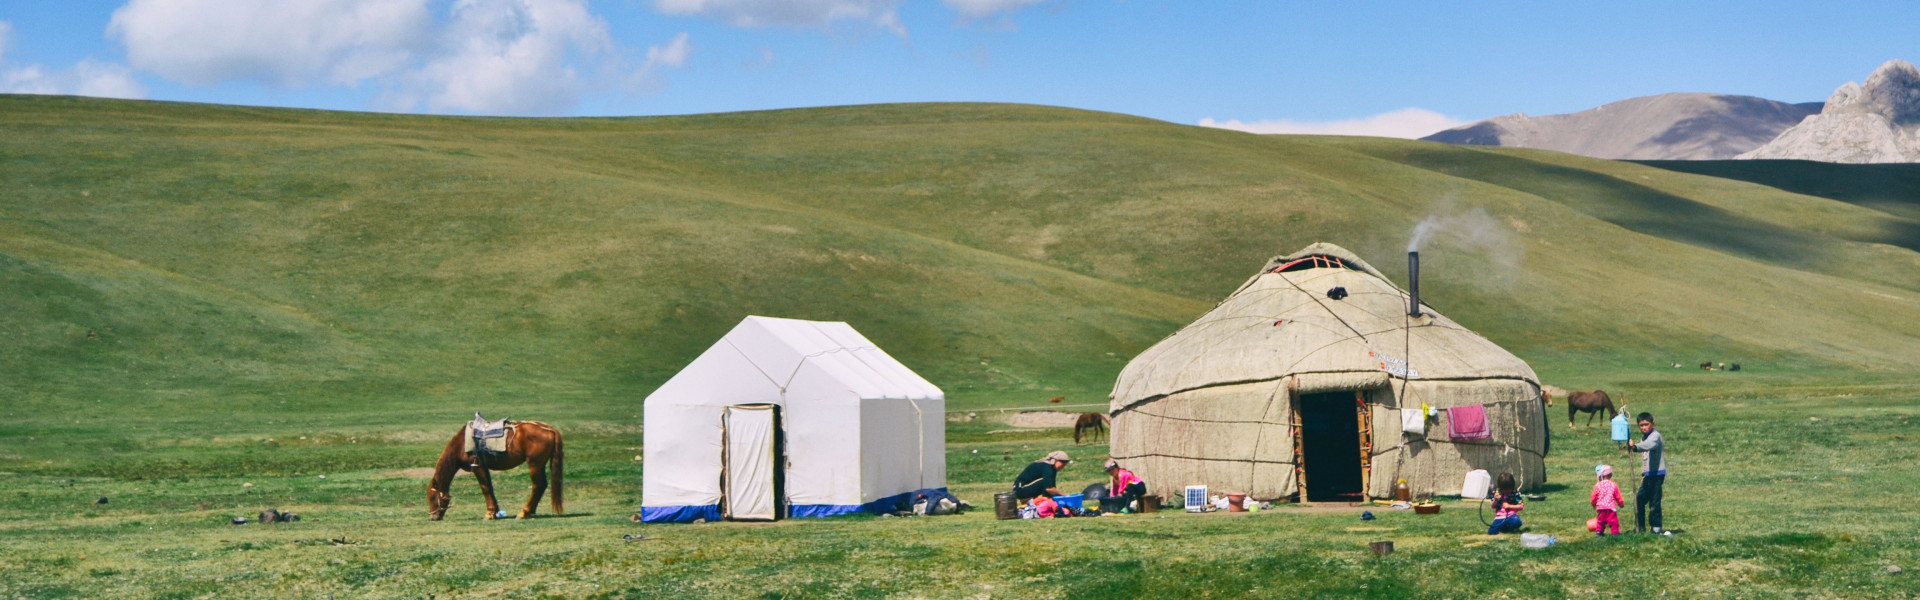 Destination image of Asie centrale